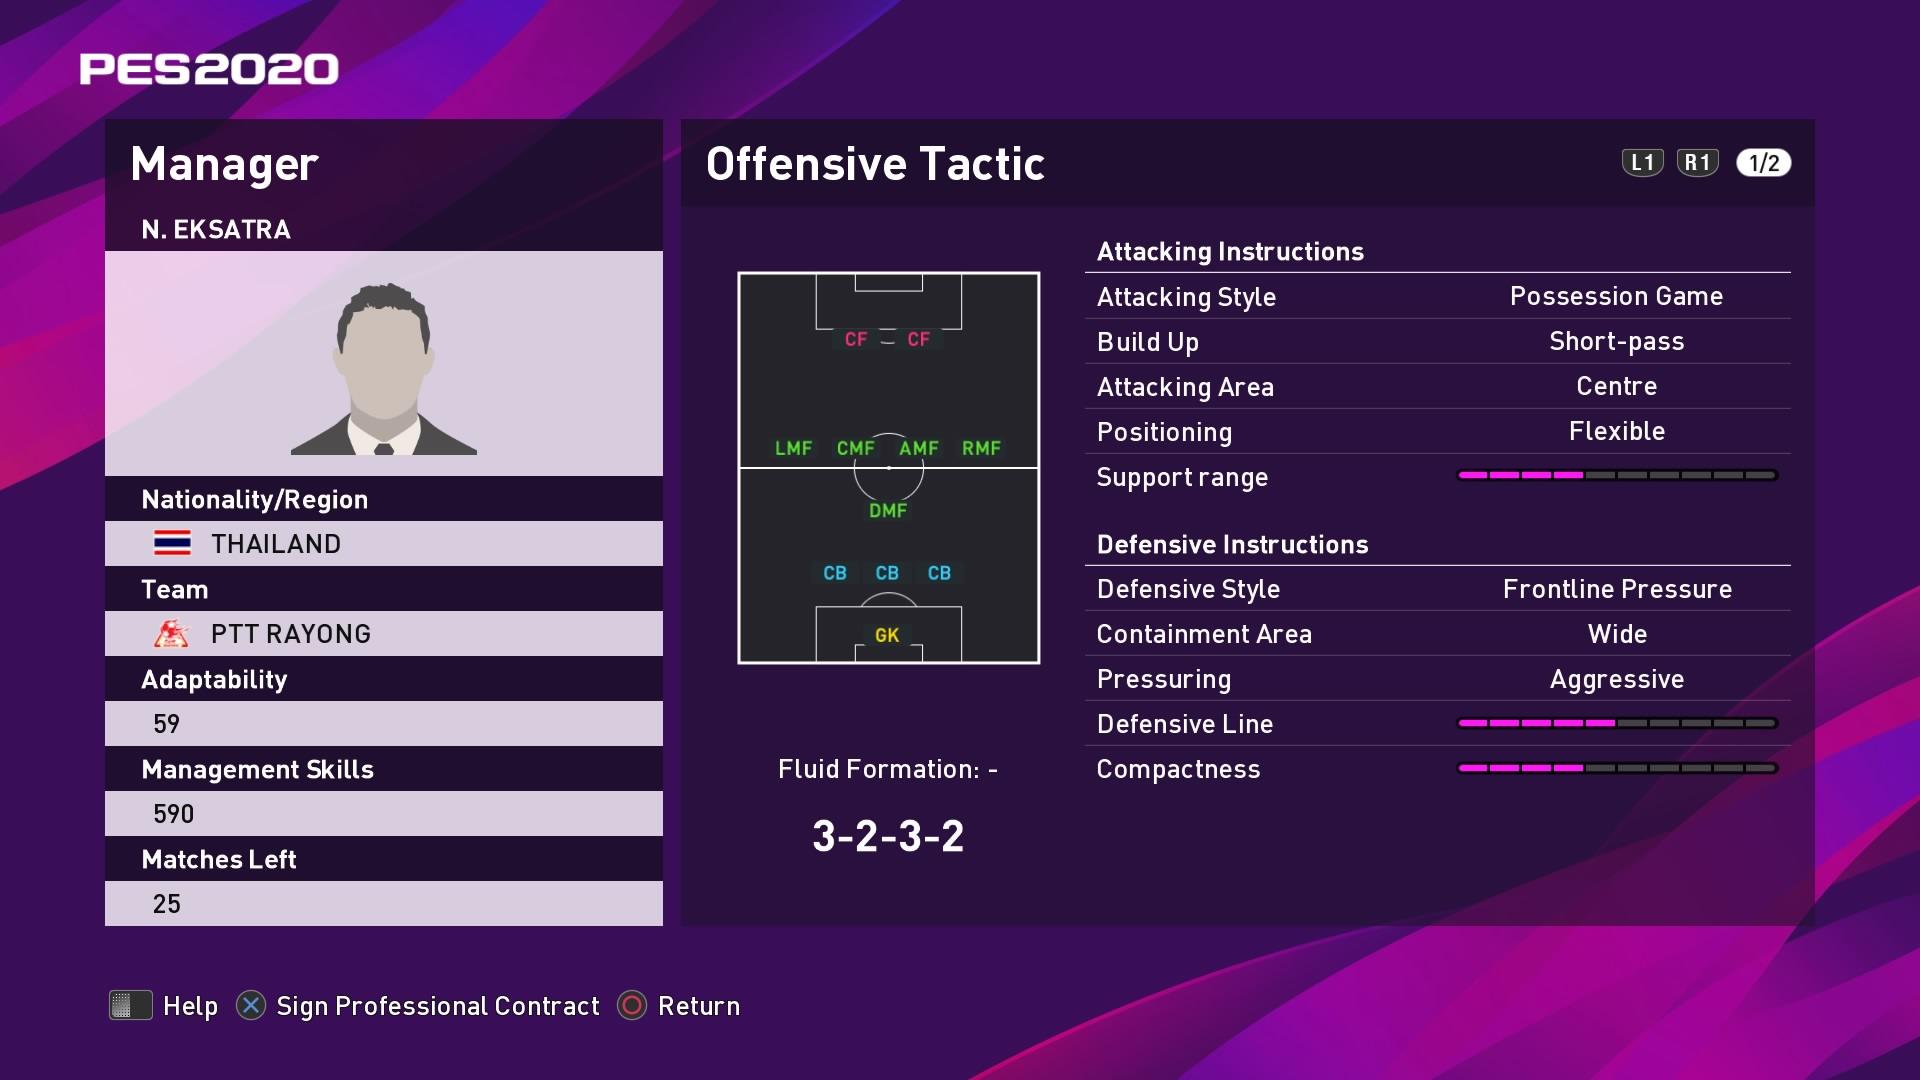 N. Eksatra (Wichanchai Hasap) Offensive Tactic in PES 2020 myClub